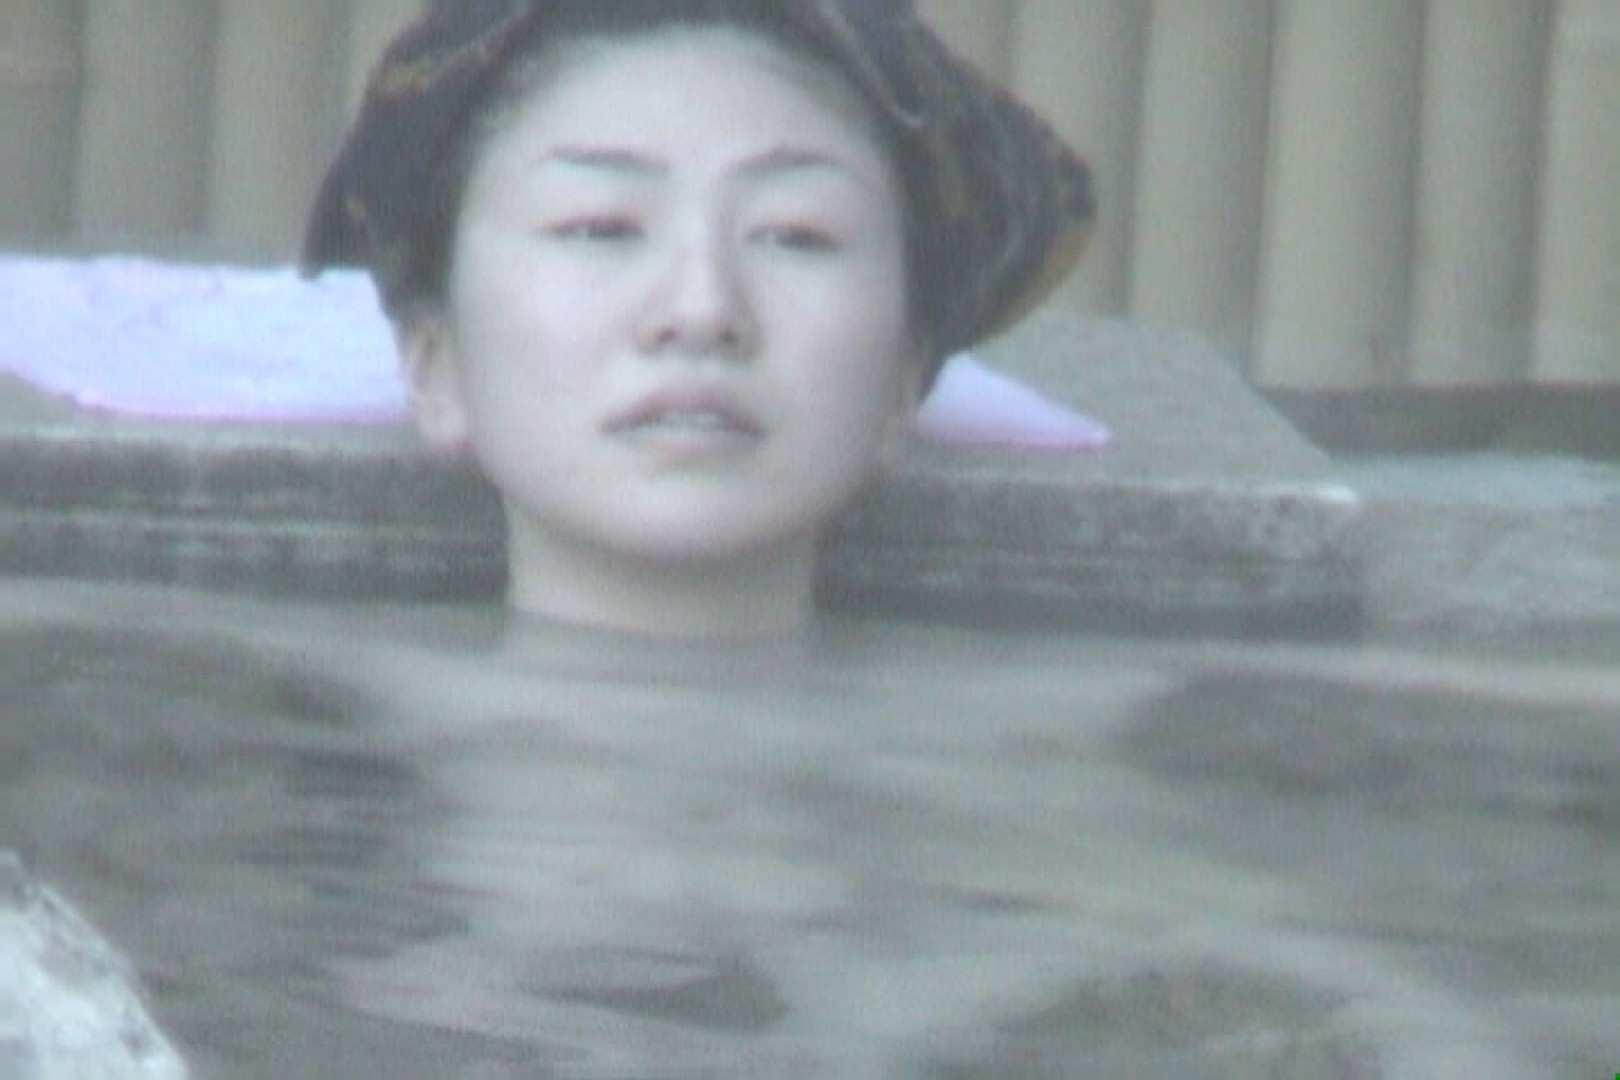 Aquaな露天風呂Vol.607 綺麗なOLたち アダルト動画キャプチャ 90枚 80